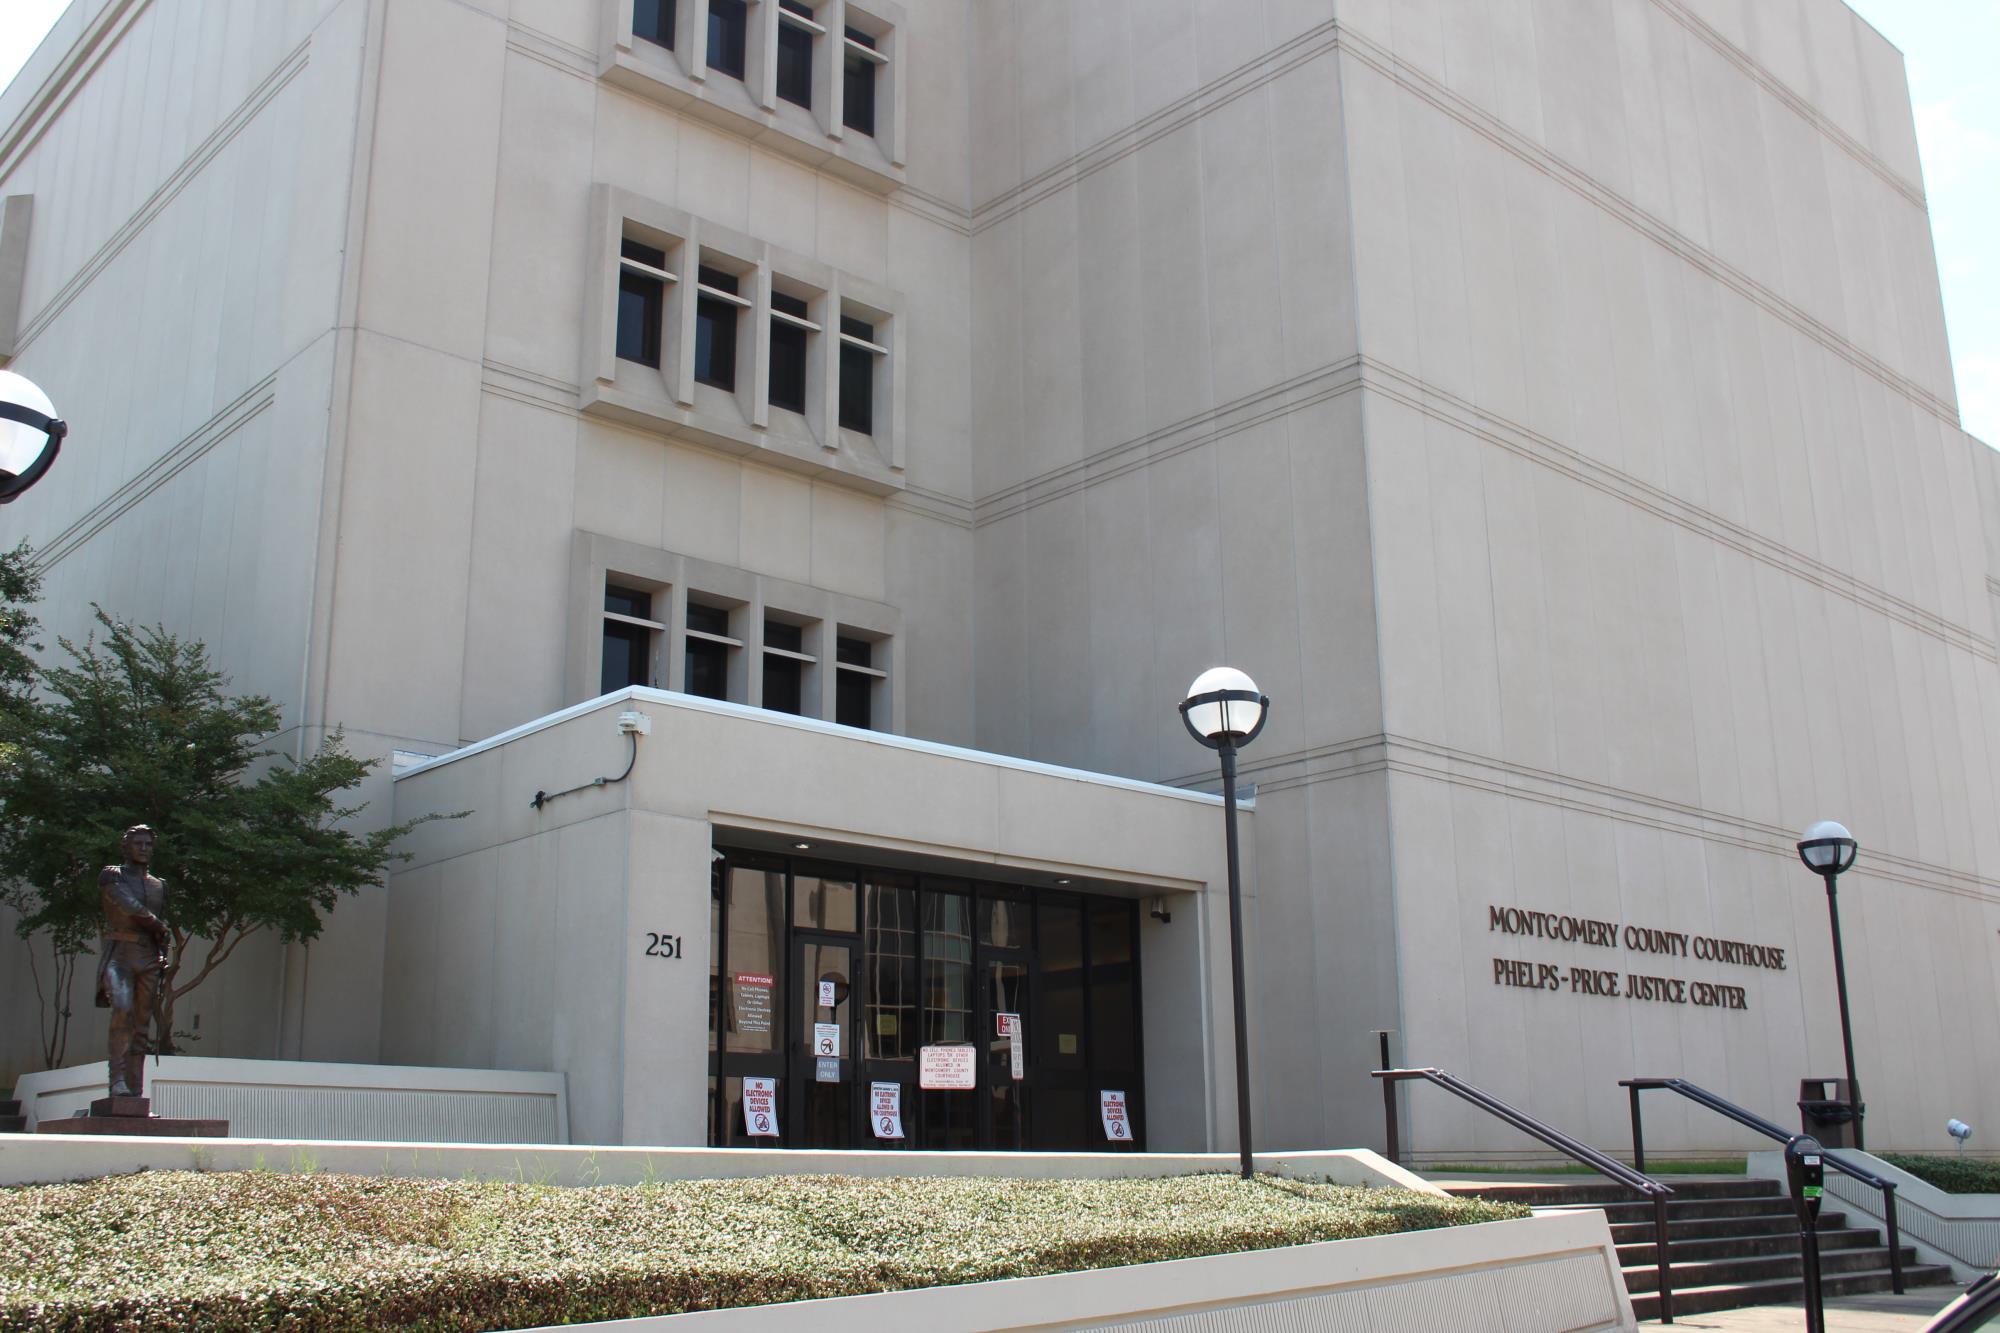 Montgomery County Courthouse Price Phelps Justice Center A County Office Montgomery County Al